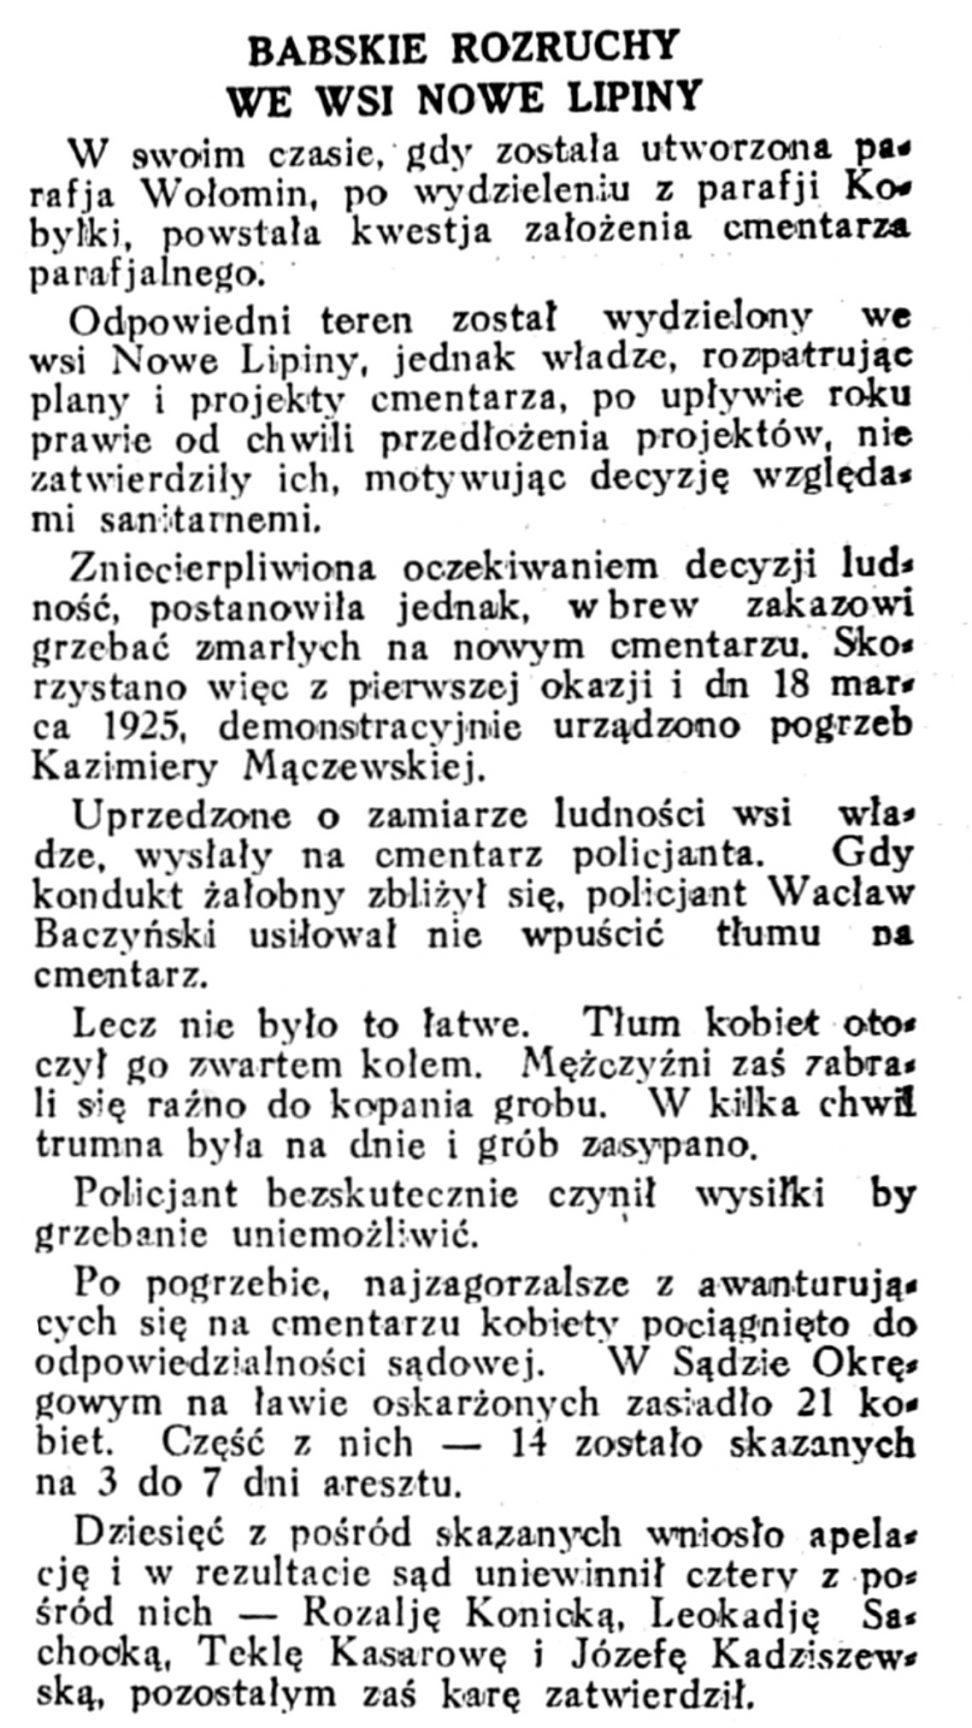 Rzeczpospolita nr 45, (14 lutego 1927)